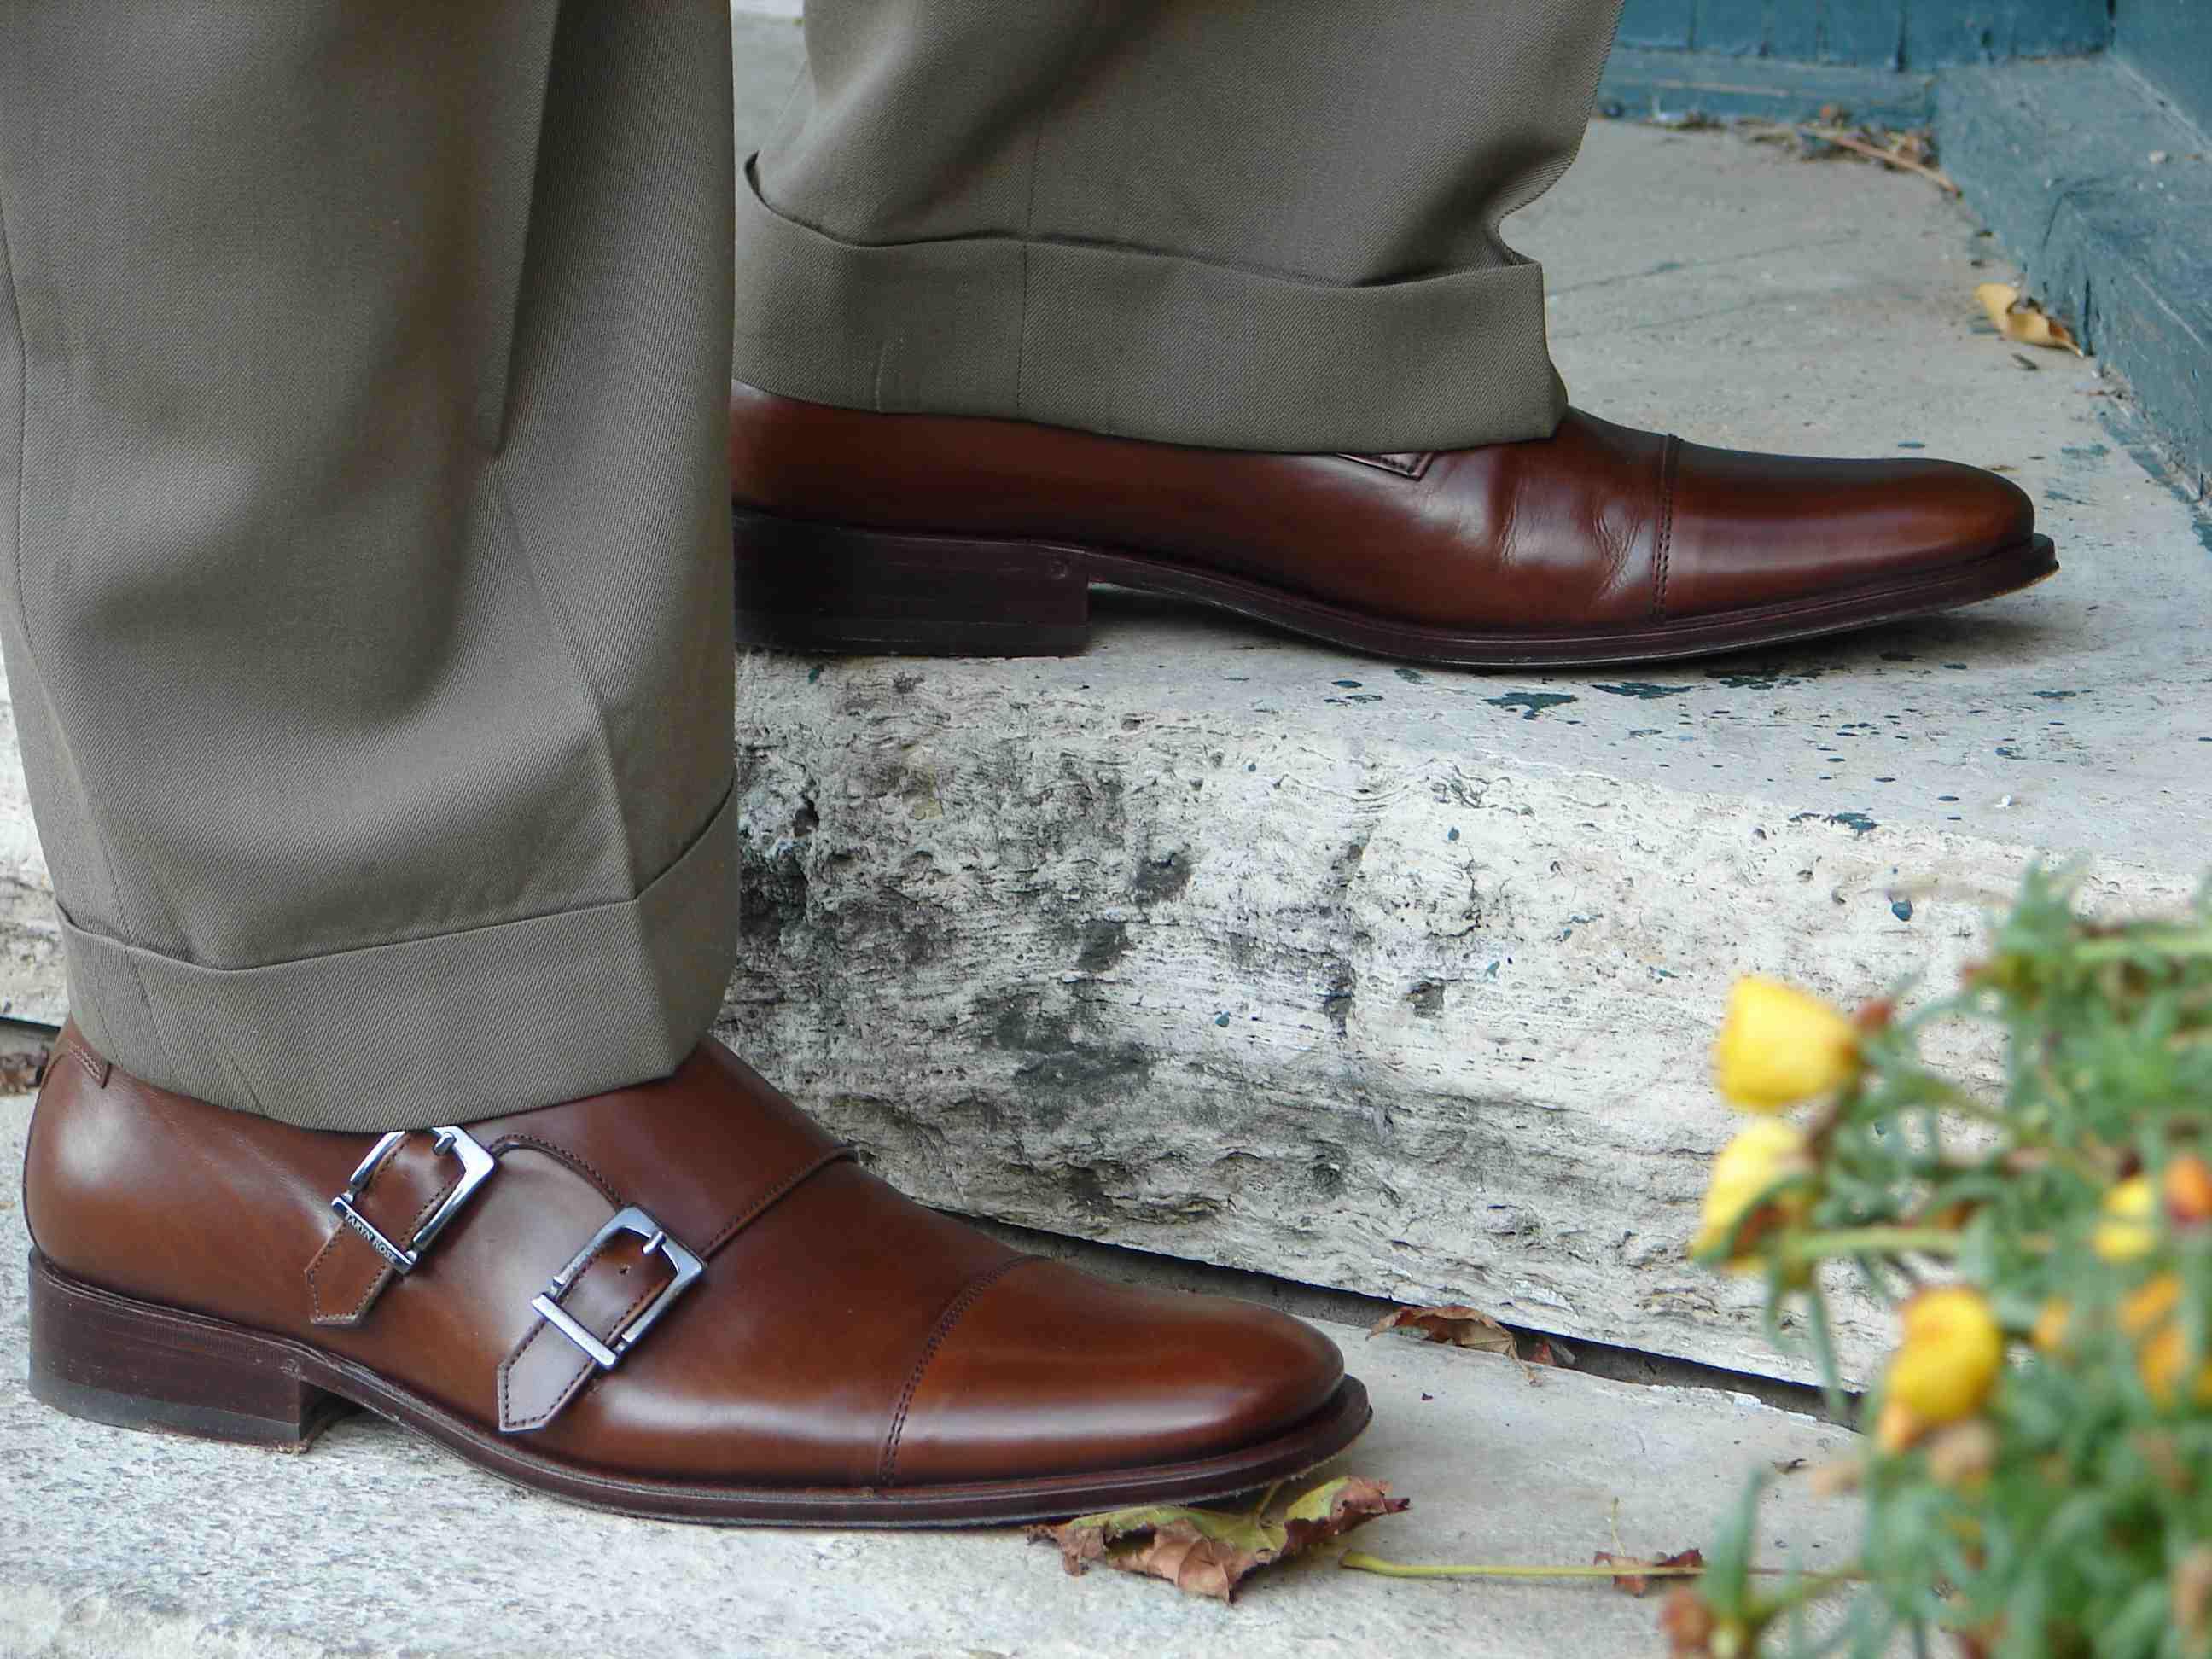 Manolo the Shoeblogger